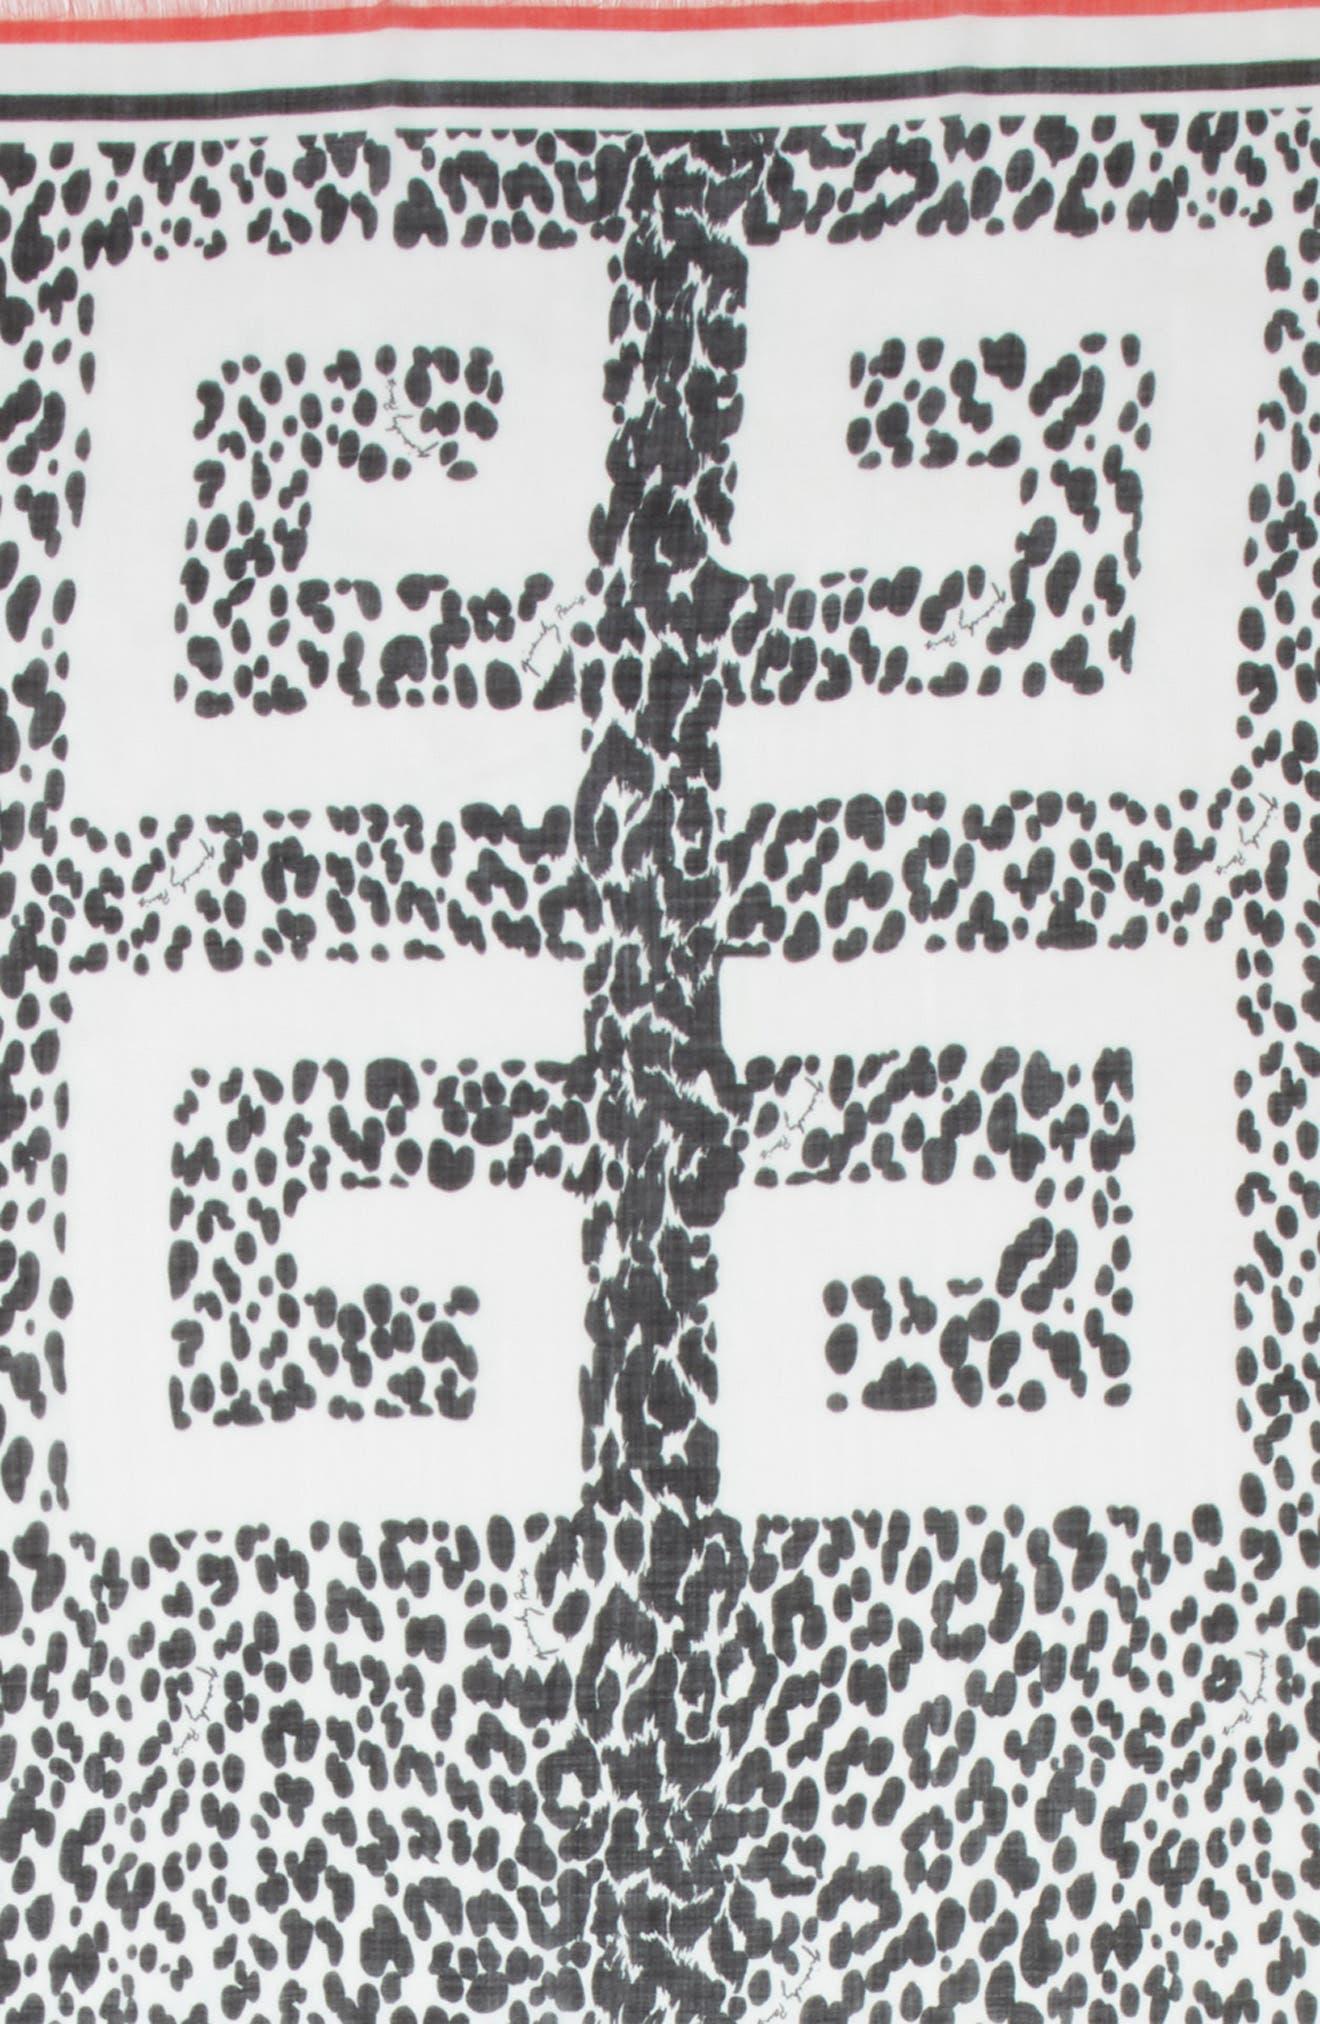 4G Leopard Cashmere & Silk Scarf,                             Alternate thumbnail 4, color,                             BLACK/ WHITE